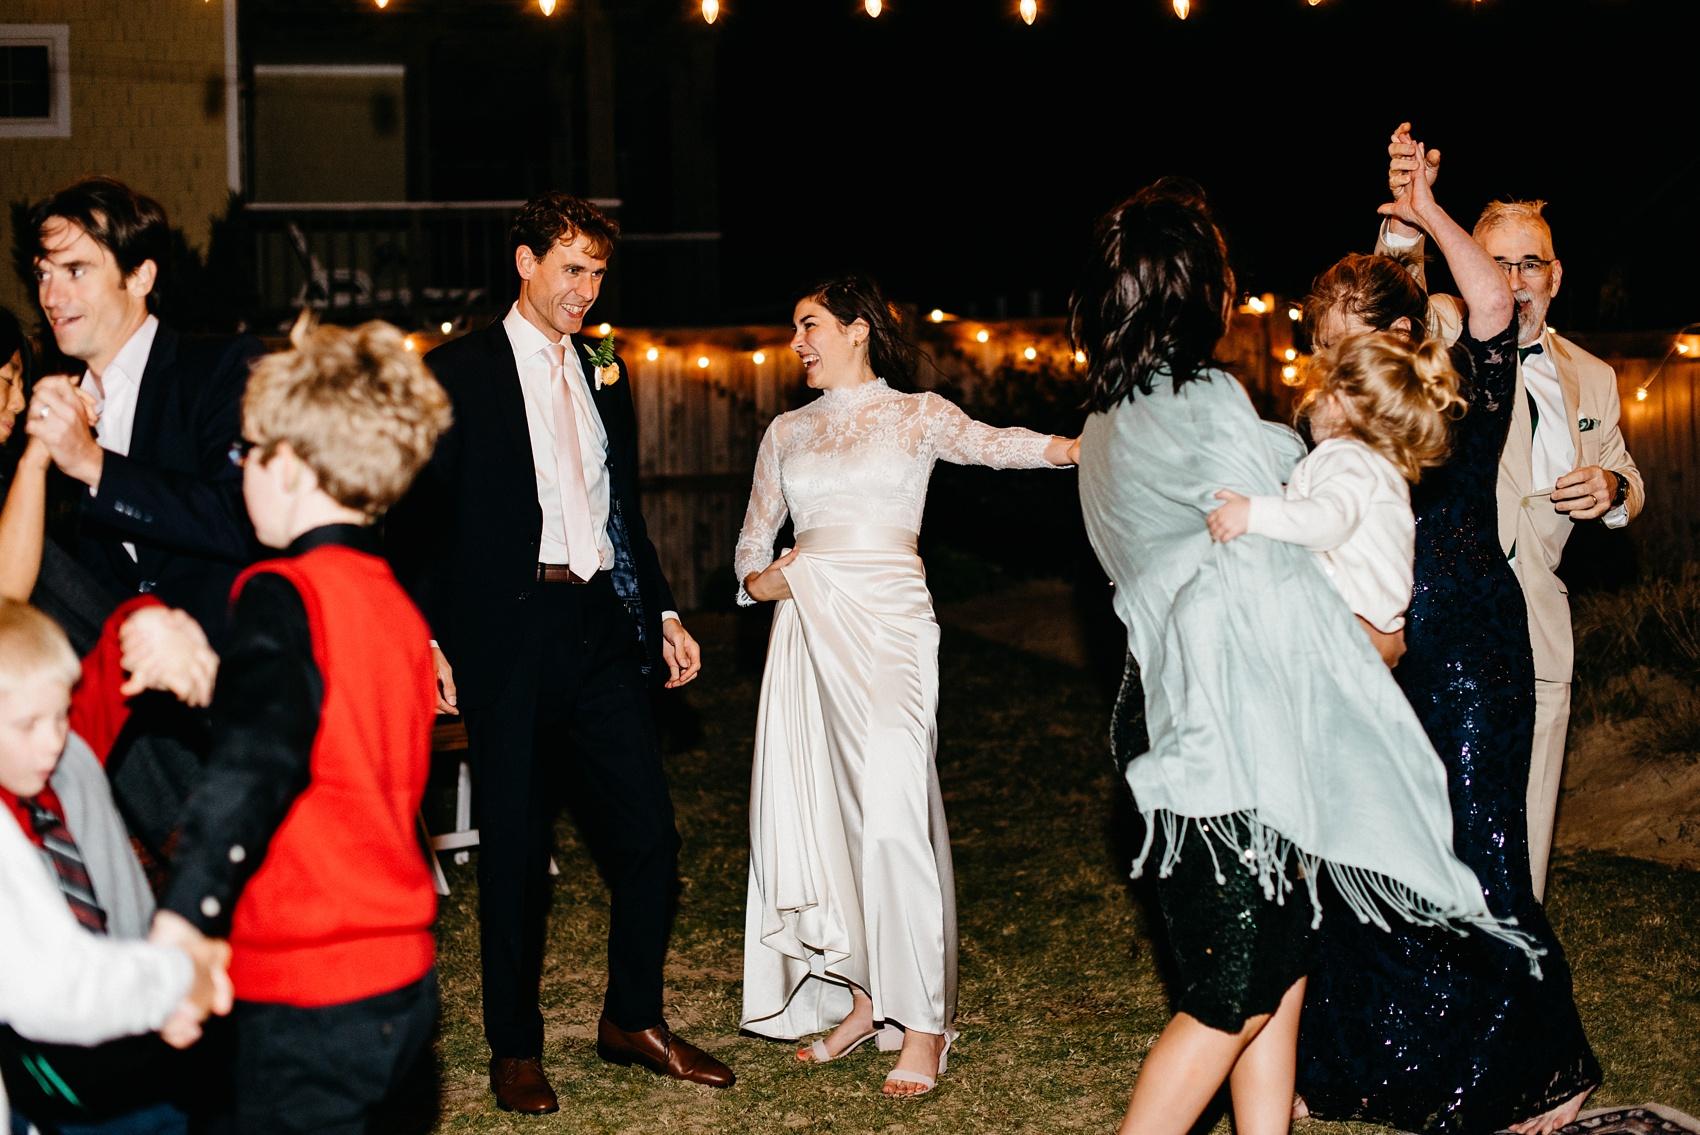 outerbanks_wedding_photographer_1343.jpg